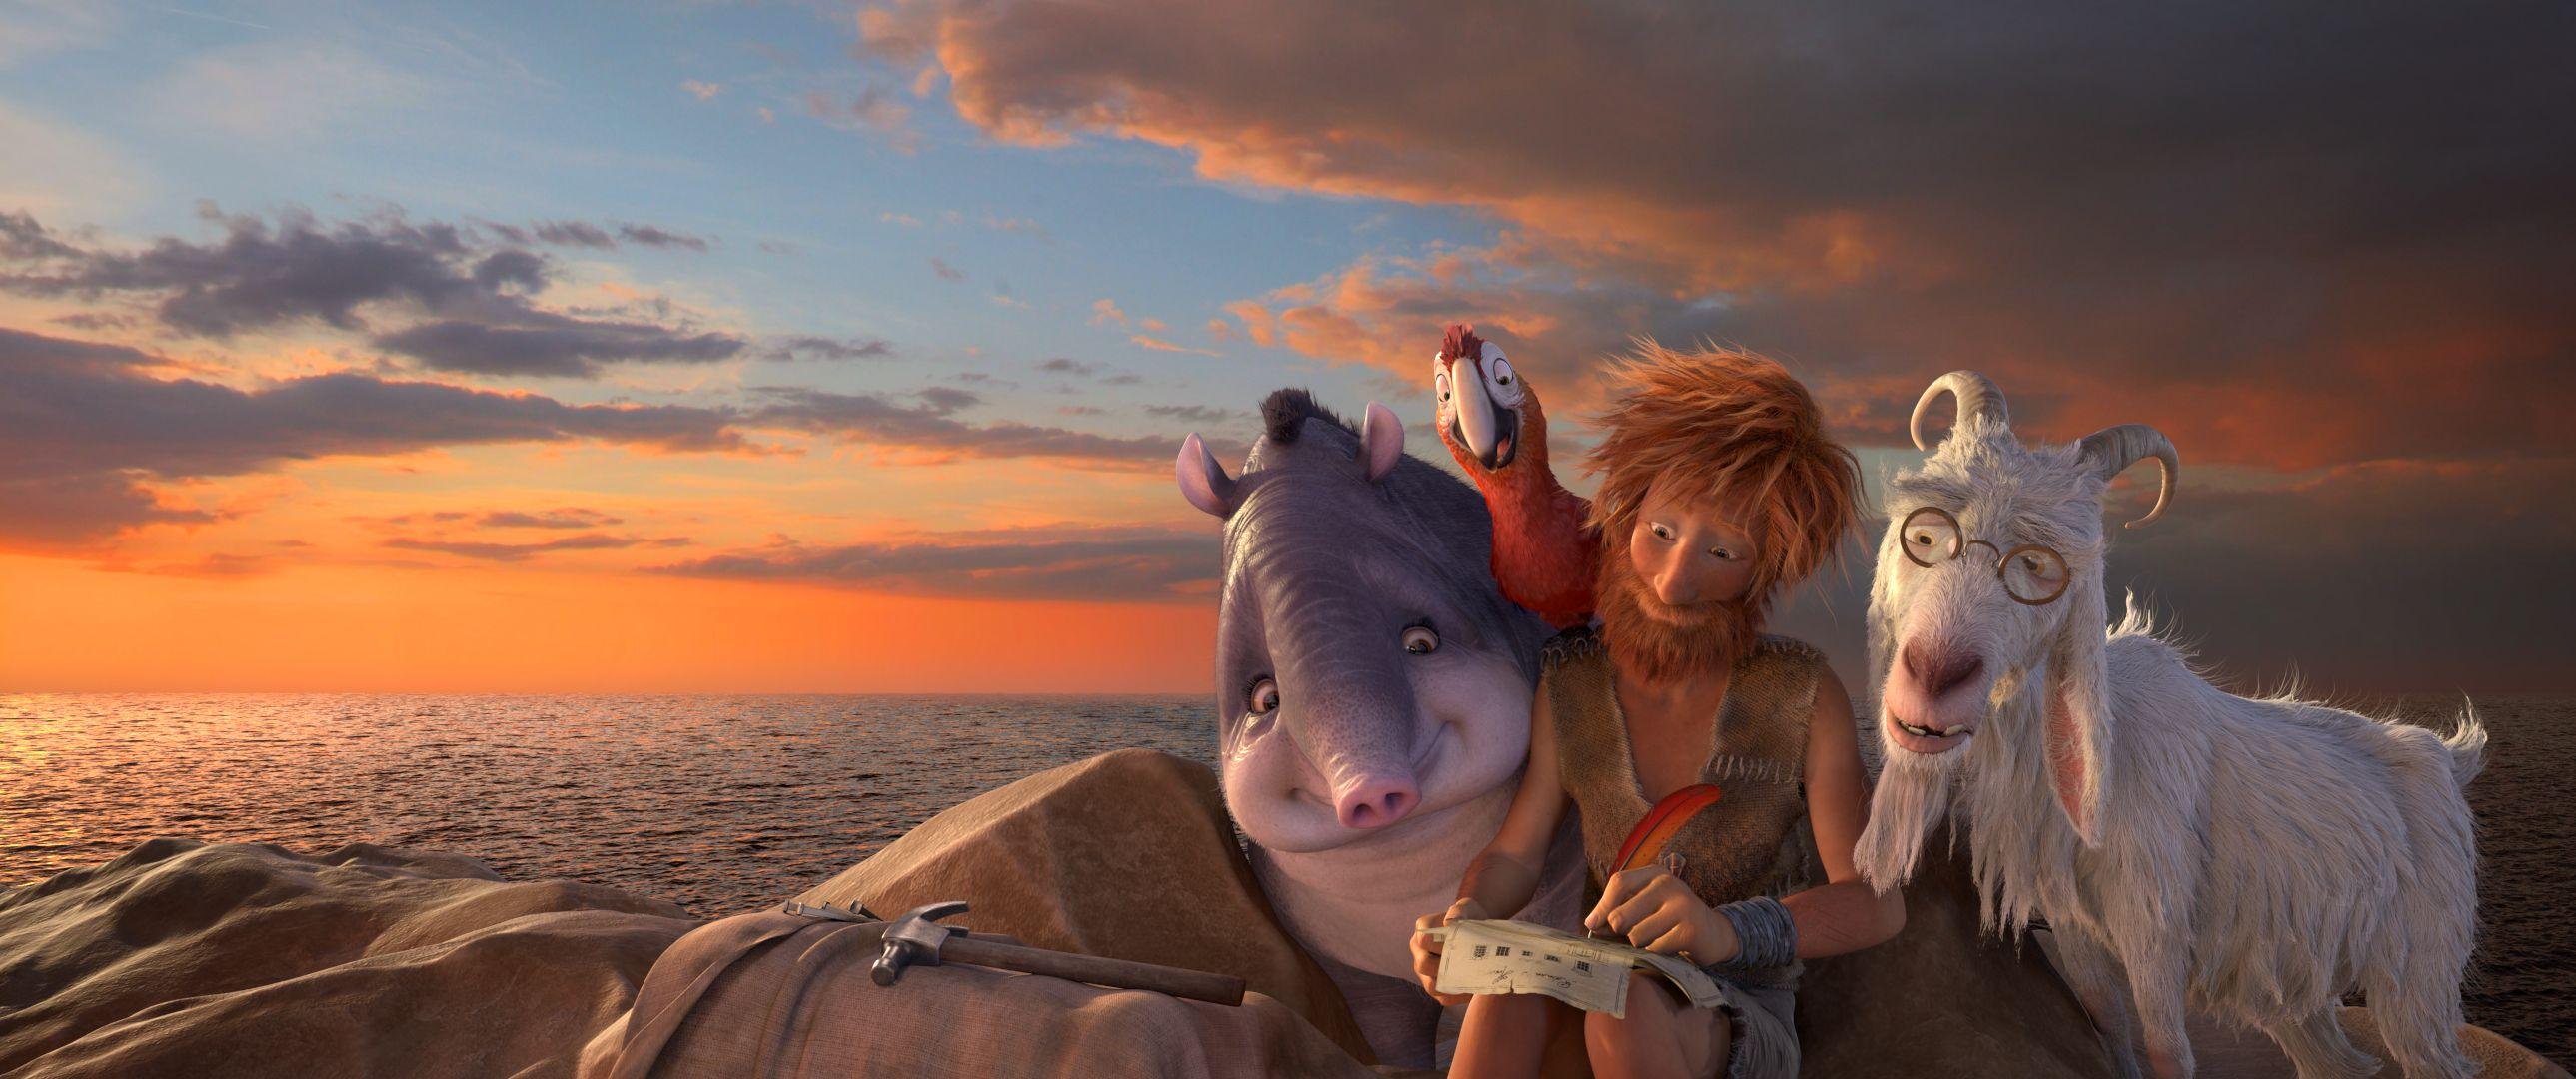 Robinson Crusoe | Film-Rezensionen.de